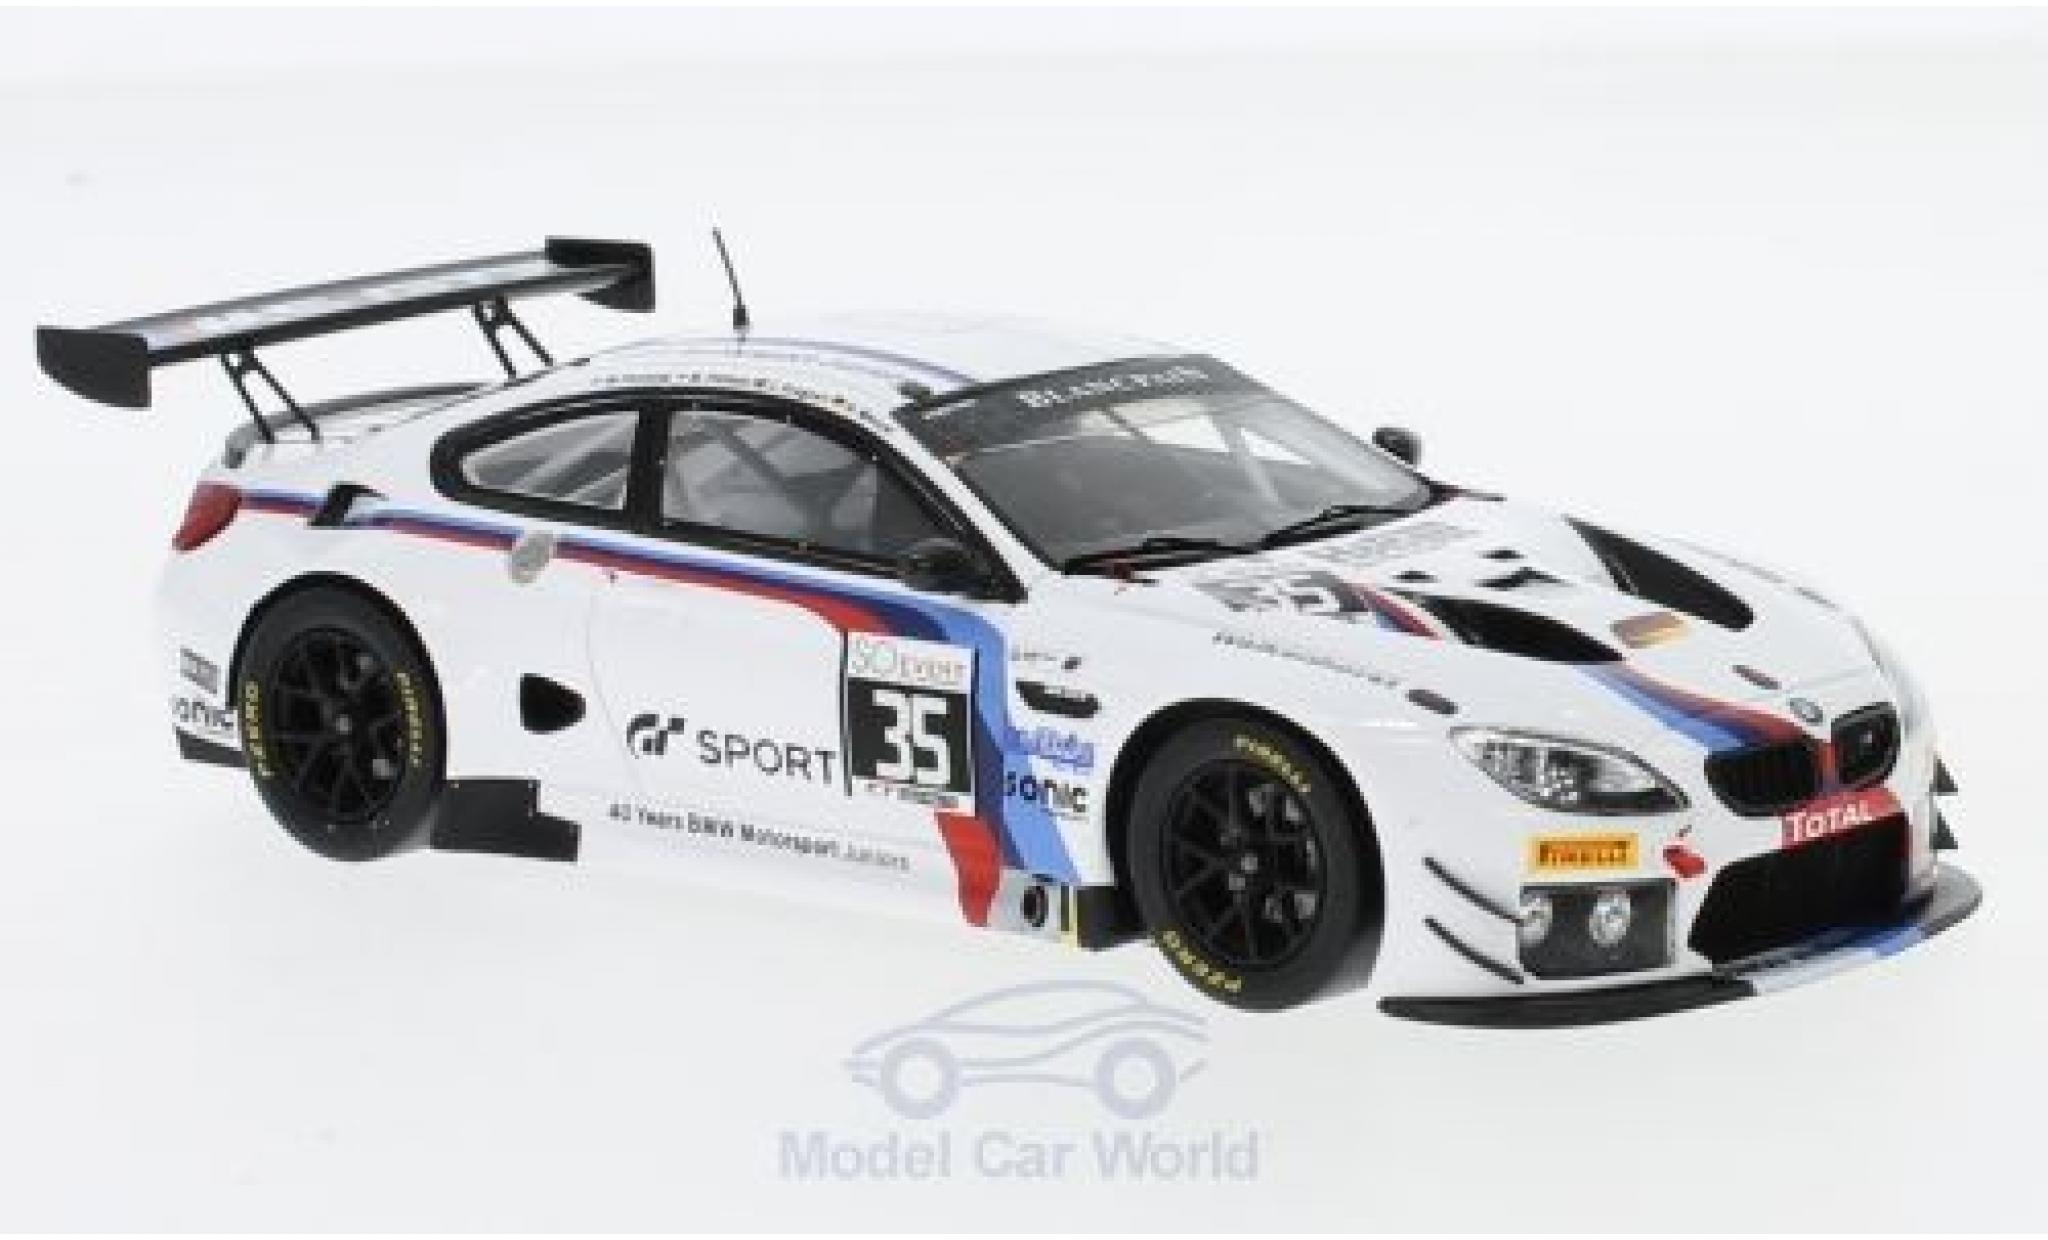 Bmw M6 1/43 Spark BMW GT3 No.35 Walkenhorst Motorsport 24h Spa 2017 M.Palttala/C.Krognes/N.Menzel/M.Henkola